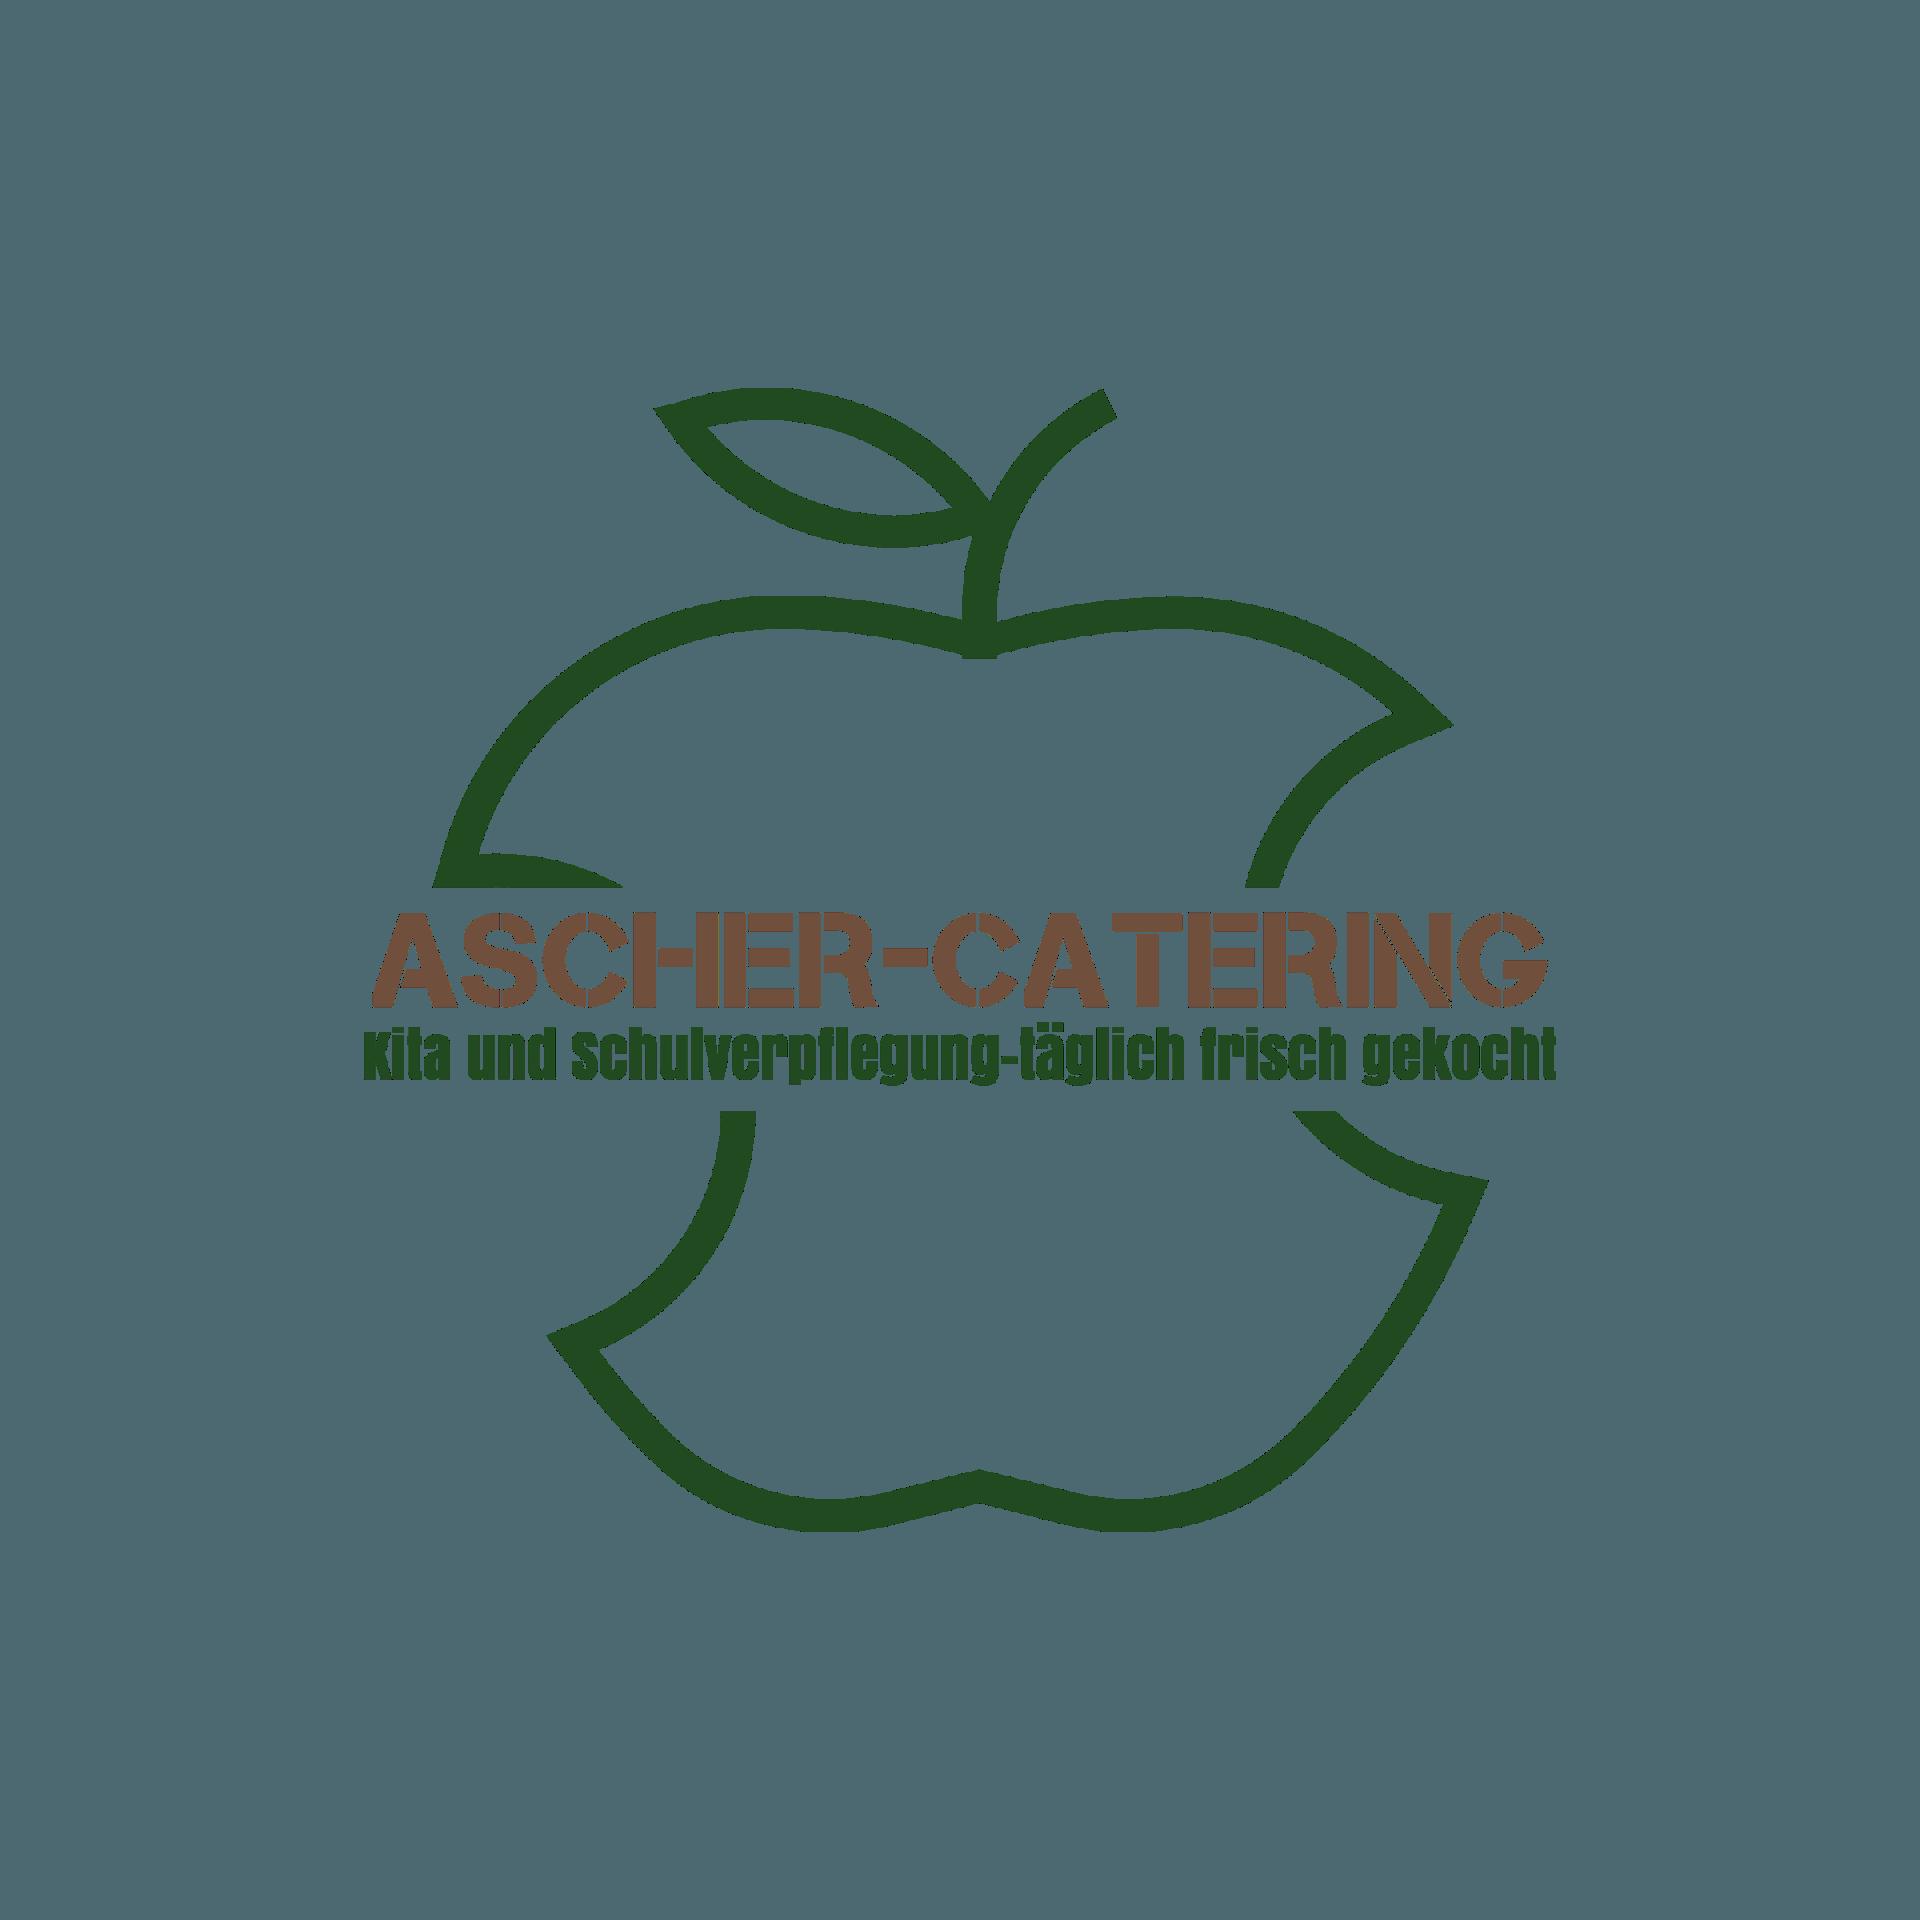 Ascher-Catering aus Oberding, Schwaig